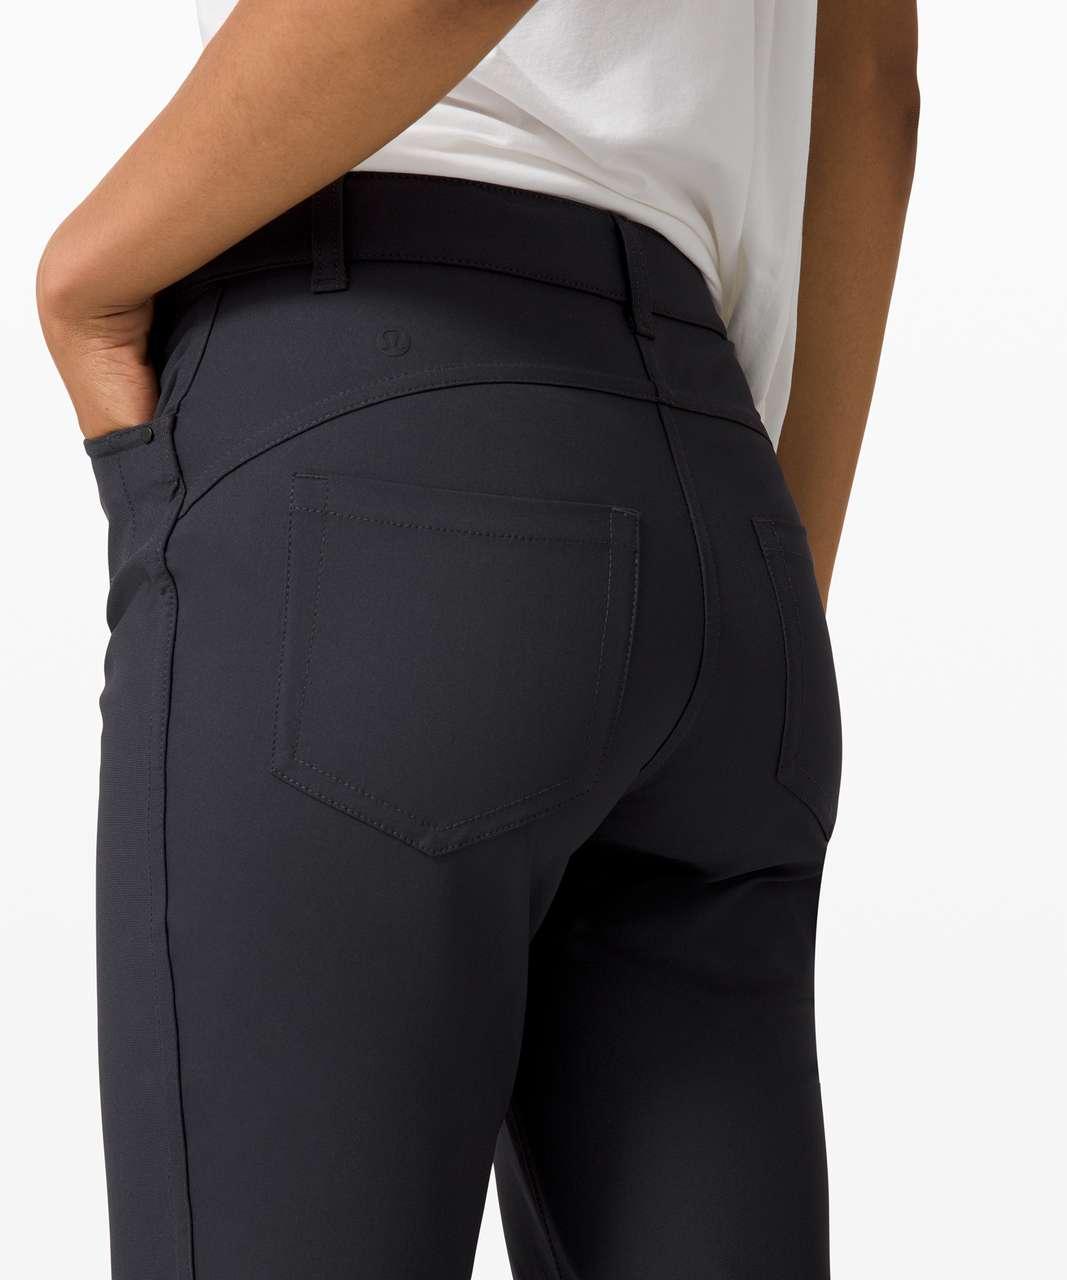 Lululemon City Sleek 5 Pocket 7/8 Pant - Obsidian